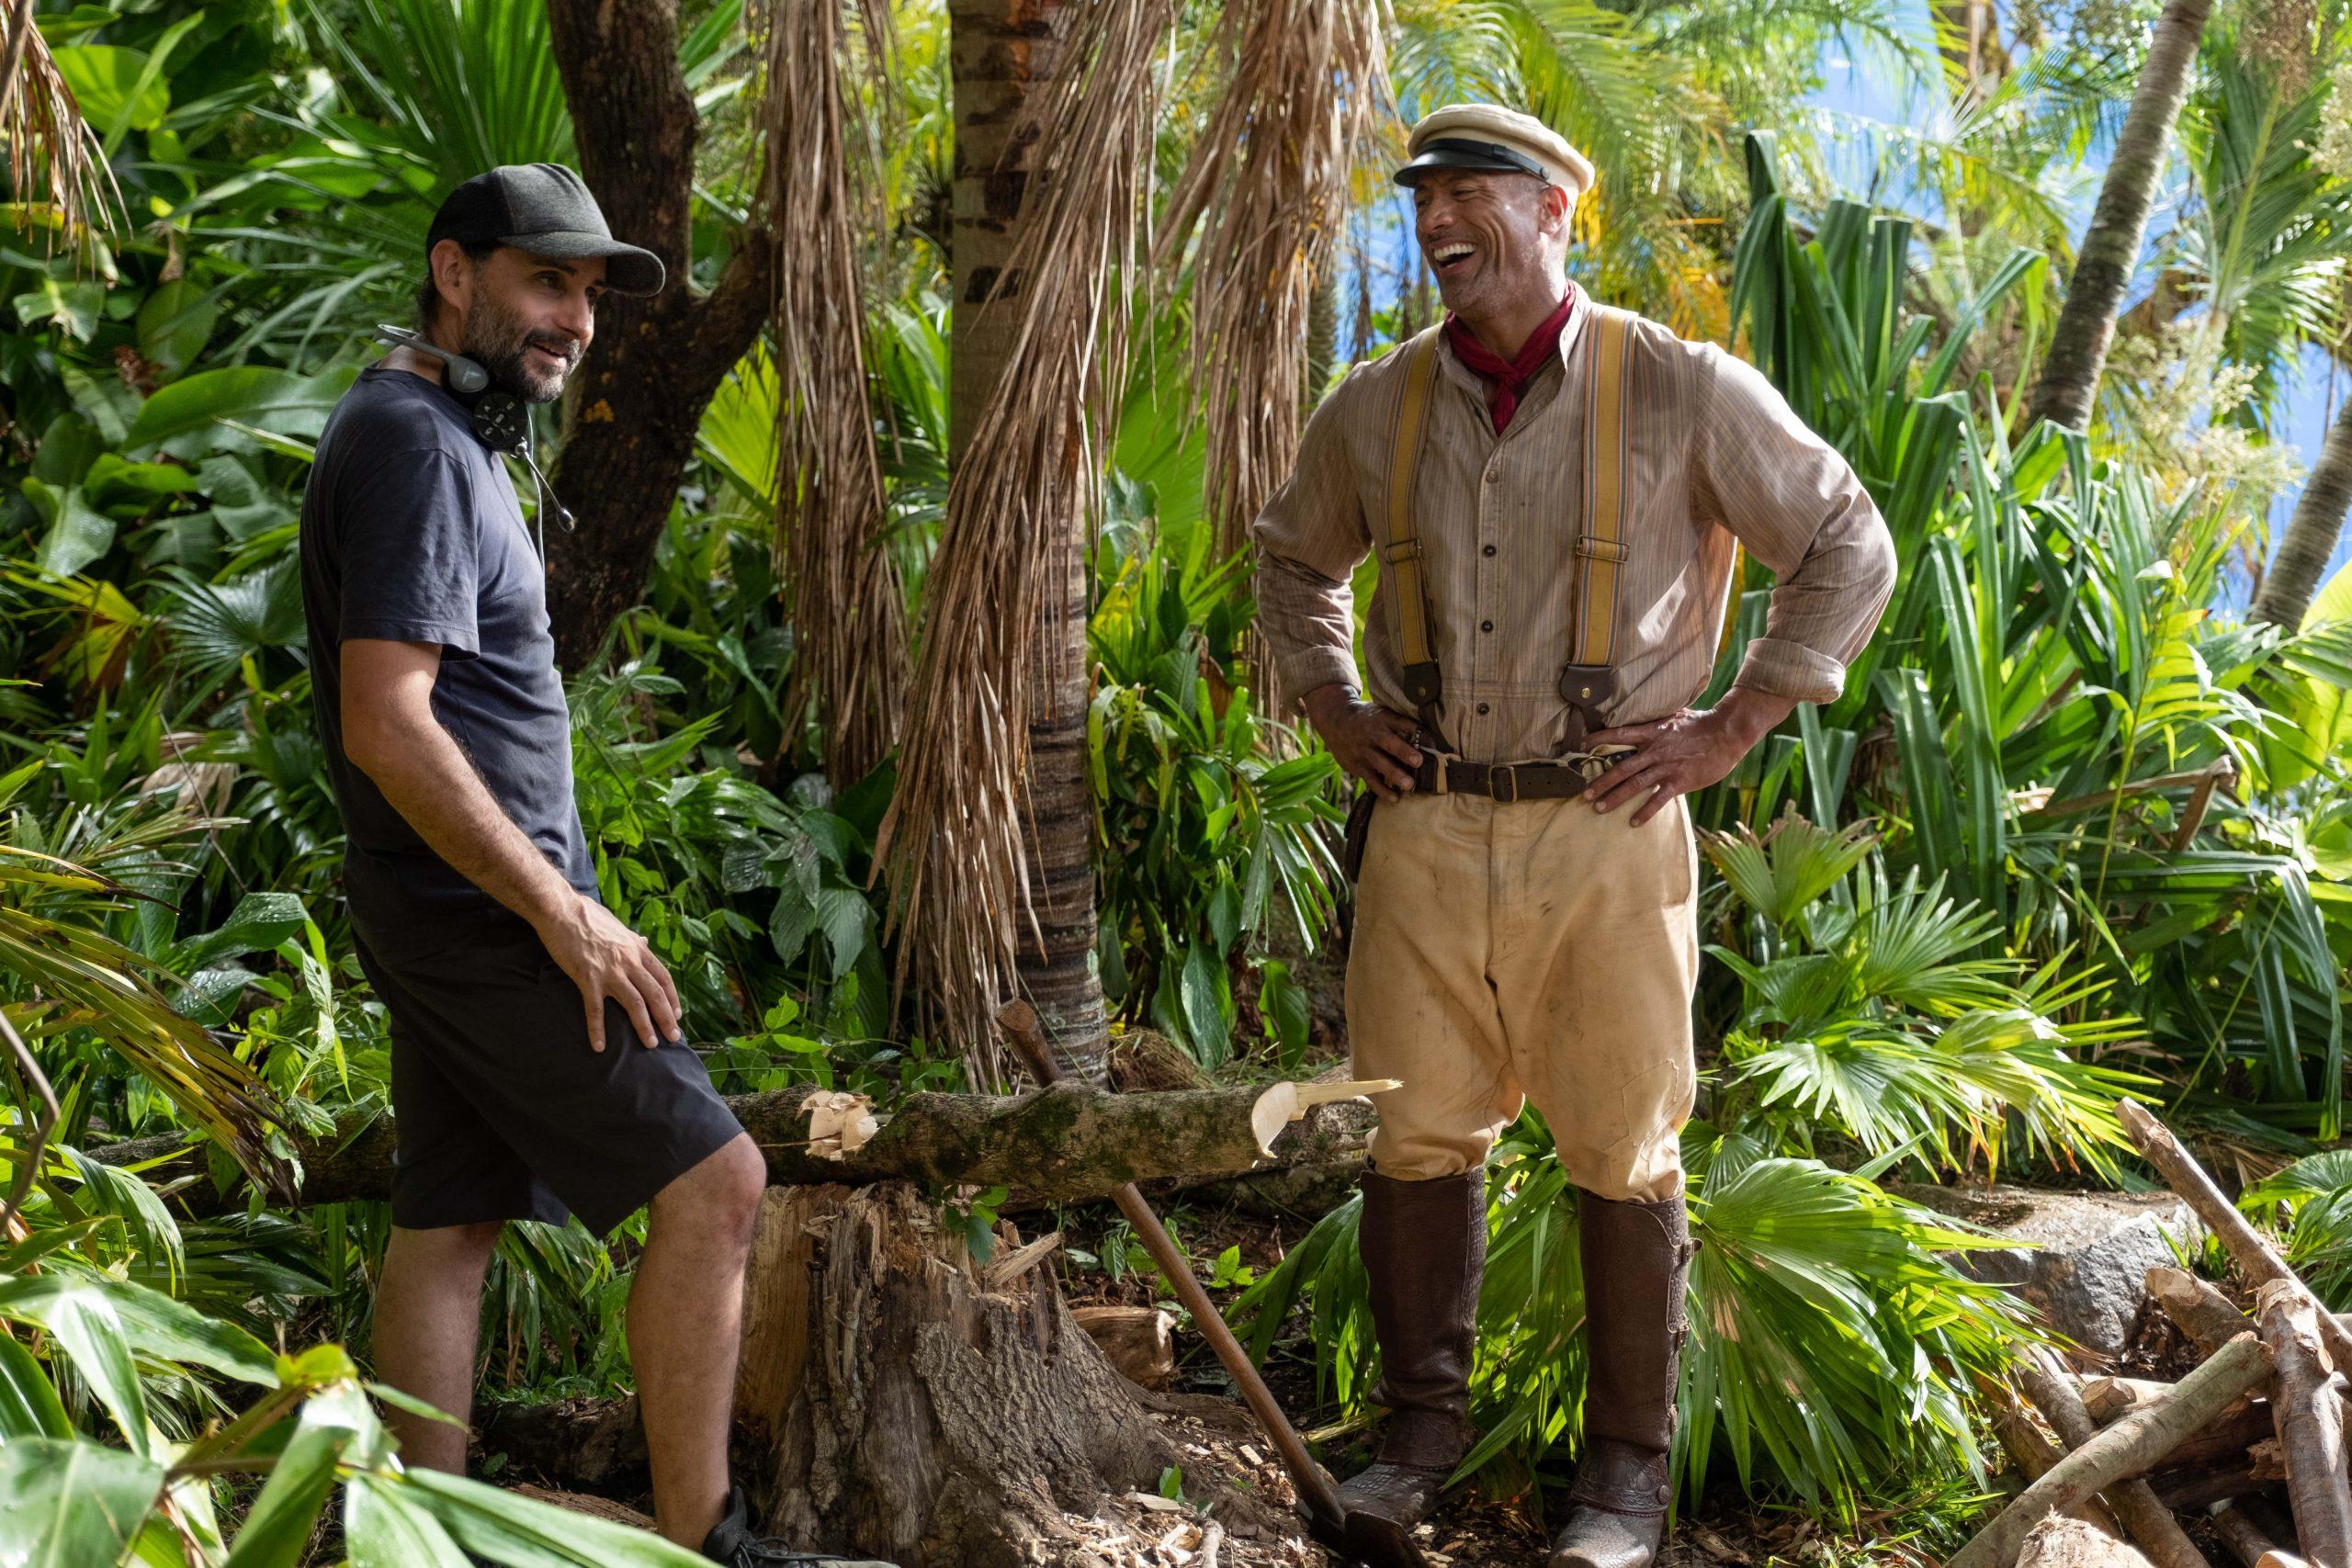 Jungle Cruise: Datos curiosos que debes saber antes del estreno